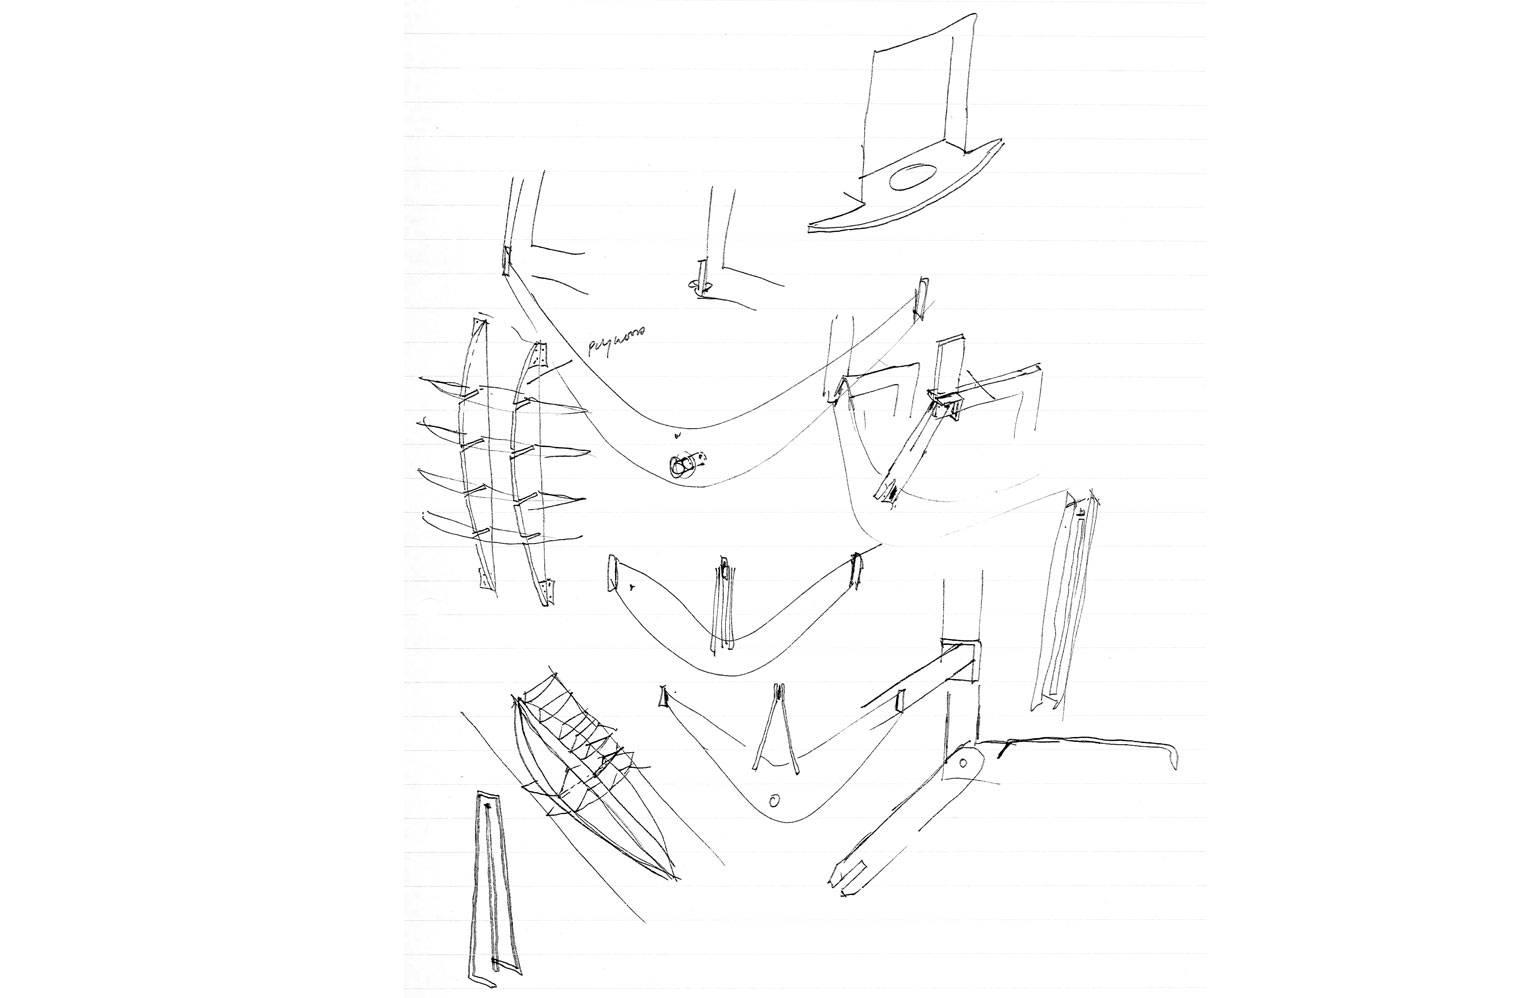 45 Leeuwen Street - Sketches of Stairs